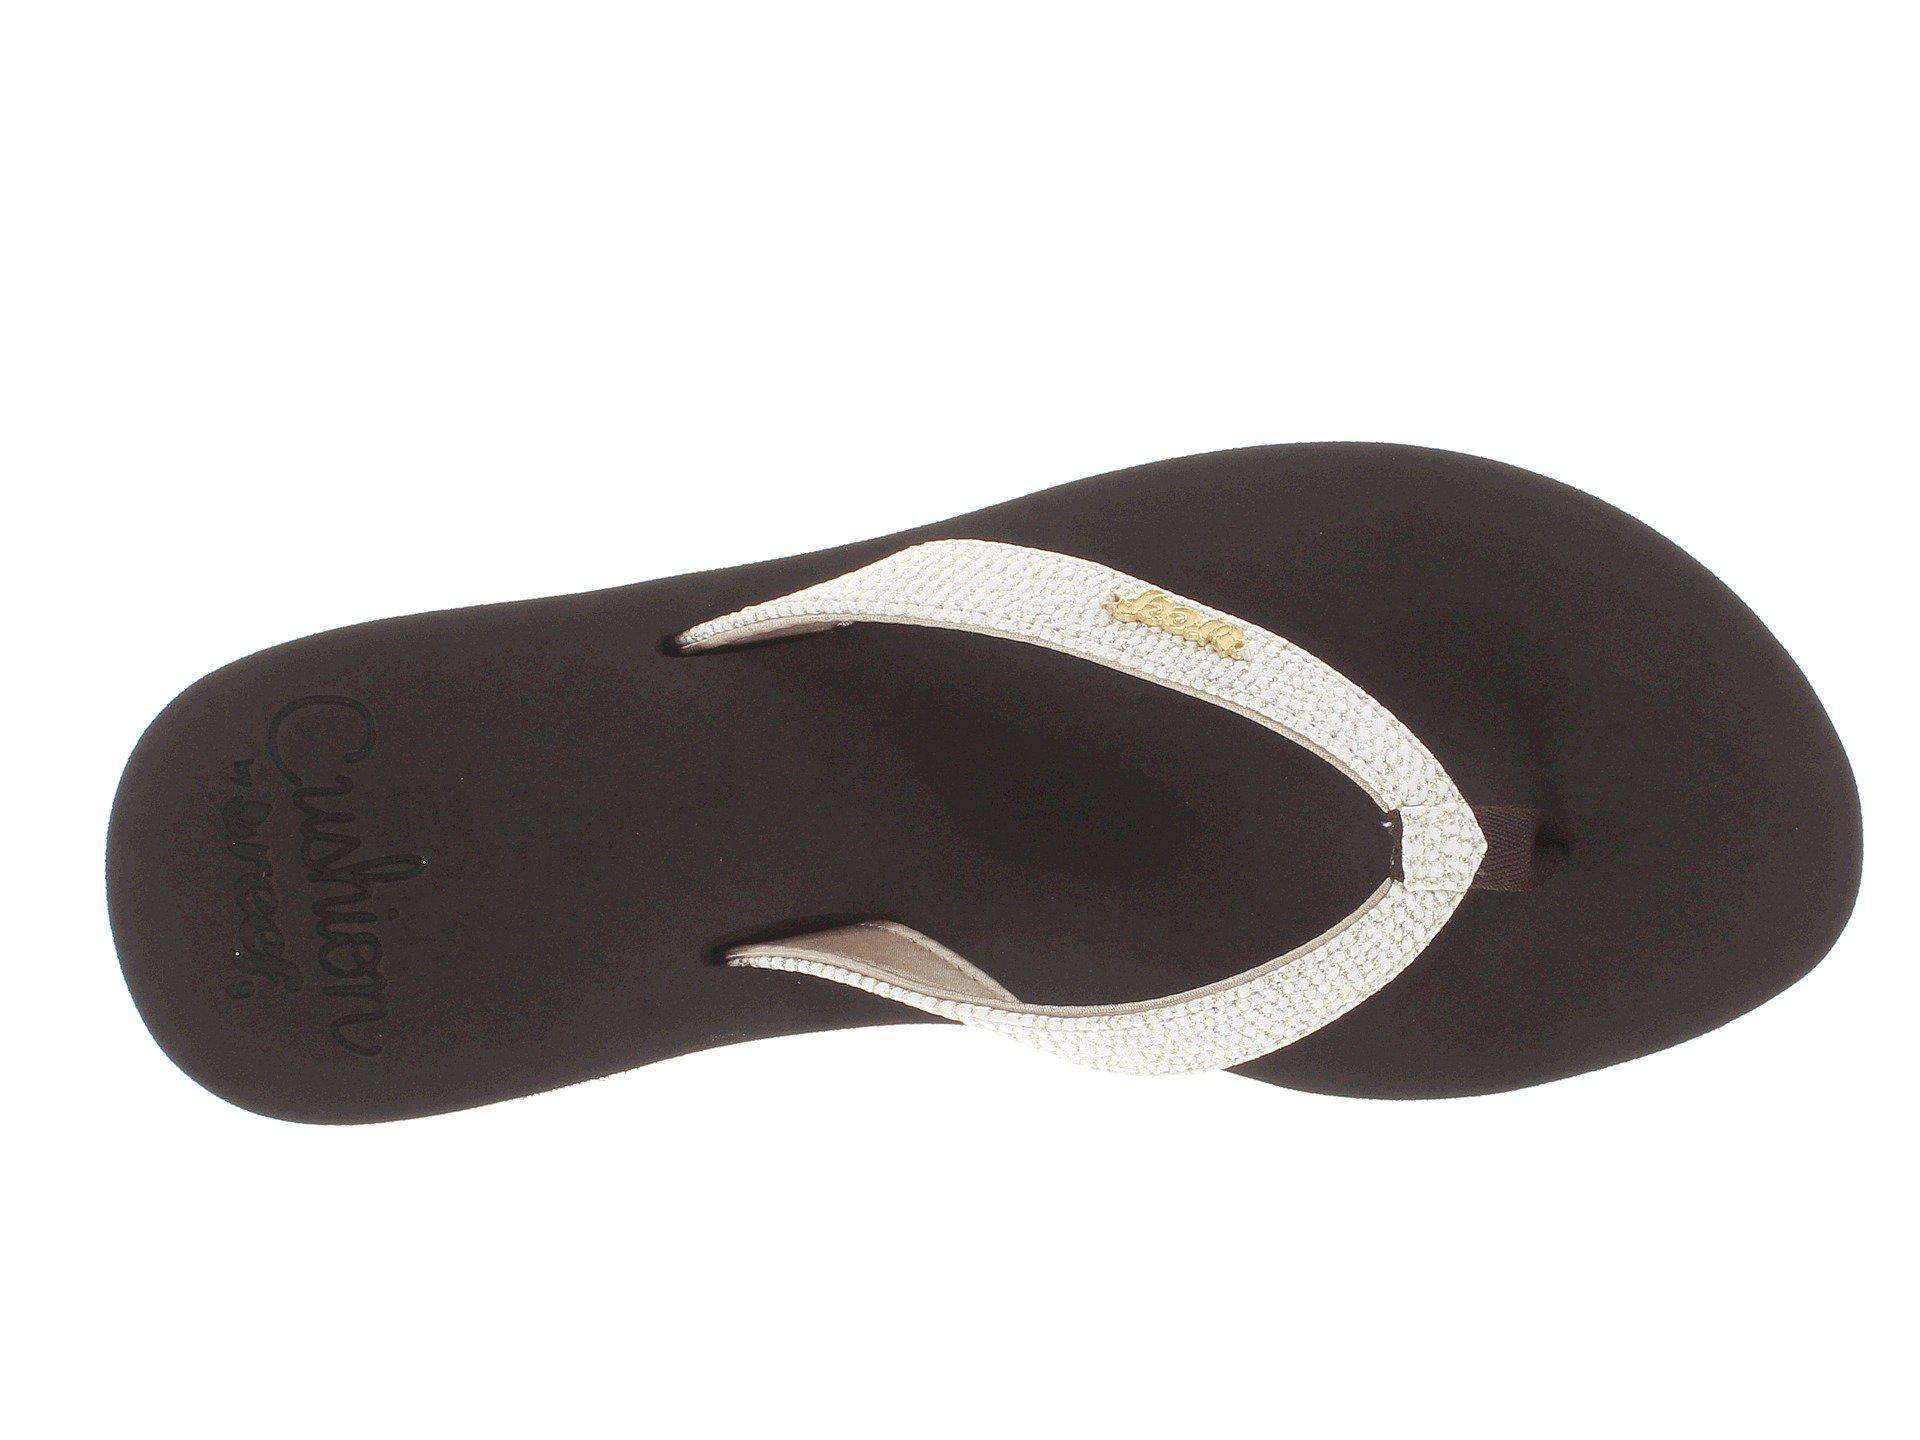 1870c1ab7100 Reef - Brown Star Cushion Sassy (black silver) Women s Sandals - Lyst. View  fullscreen